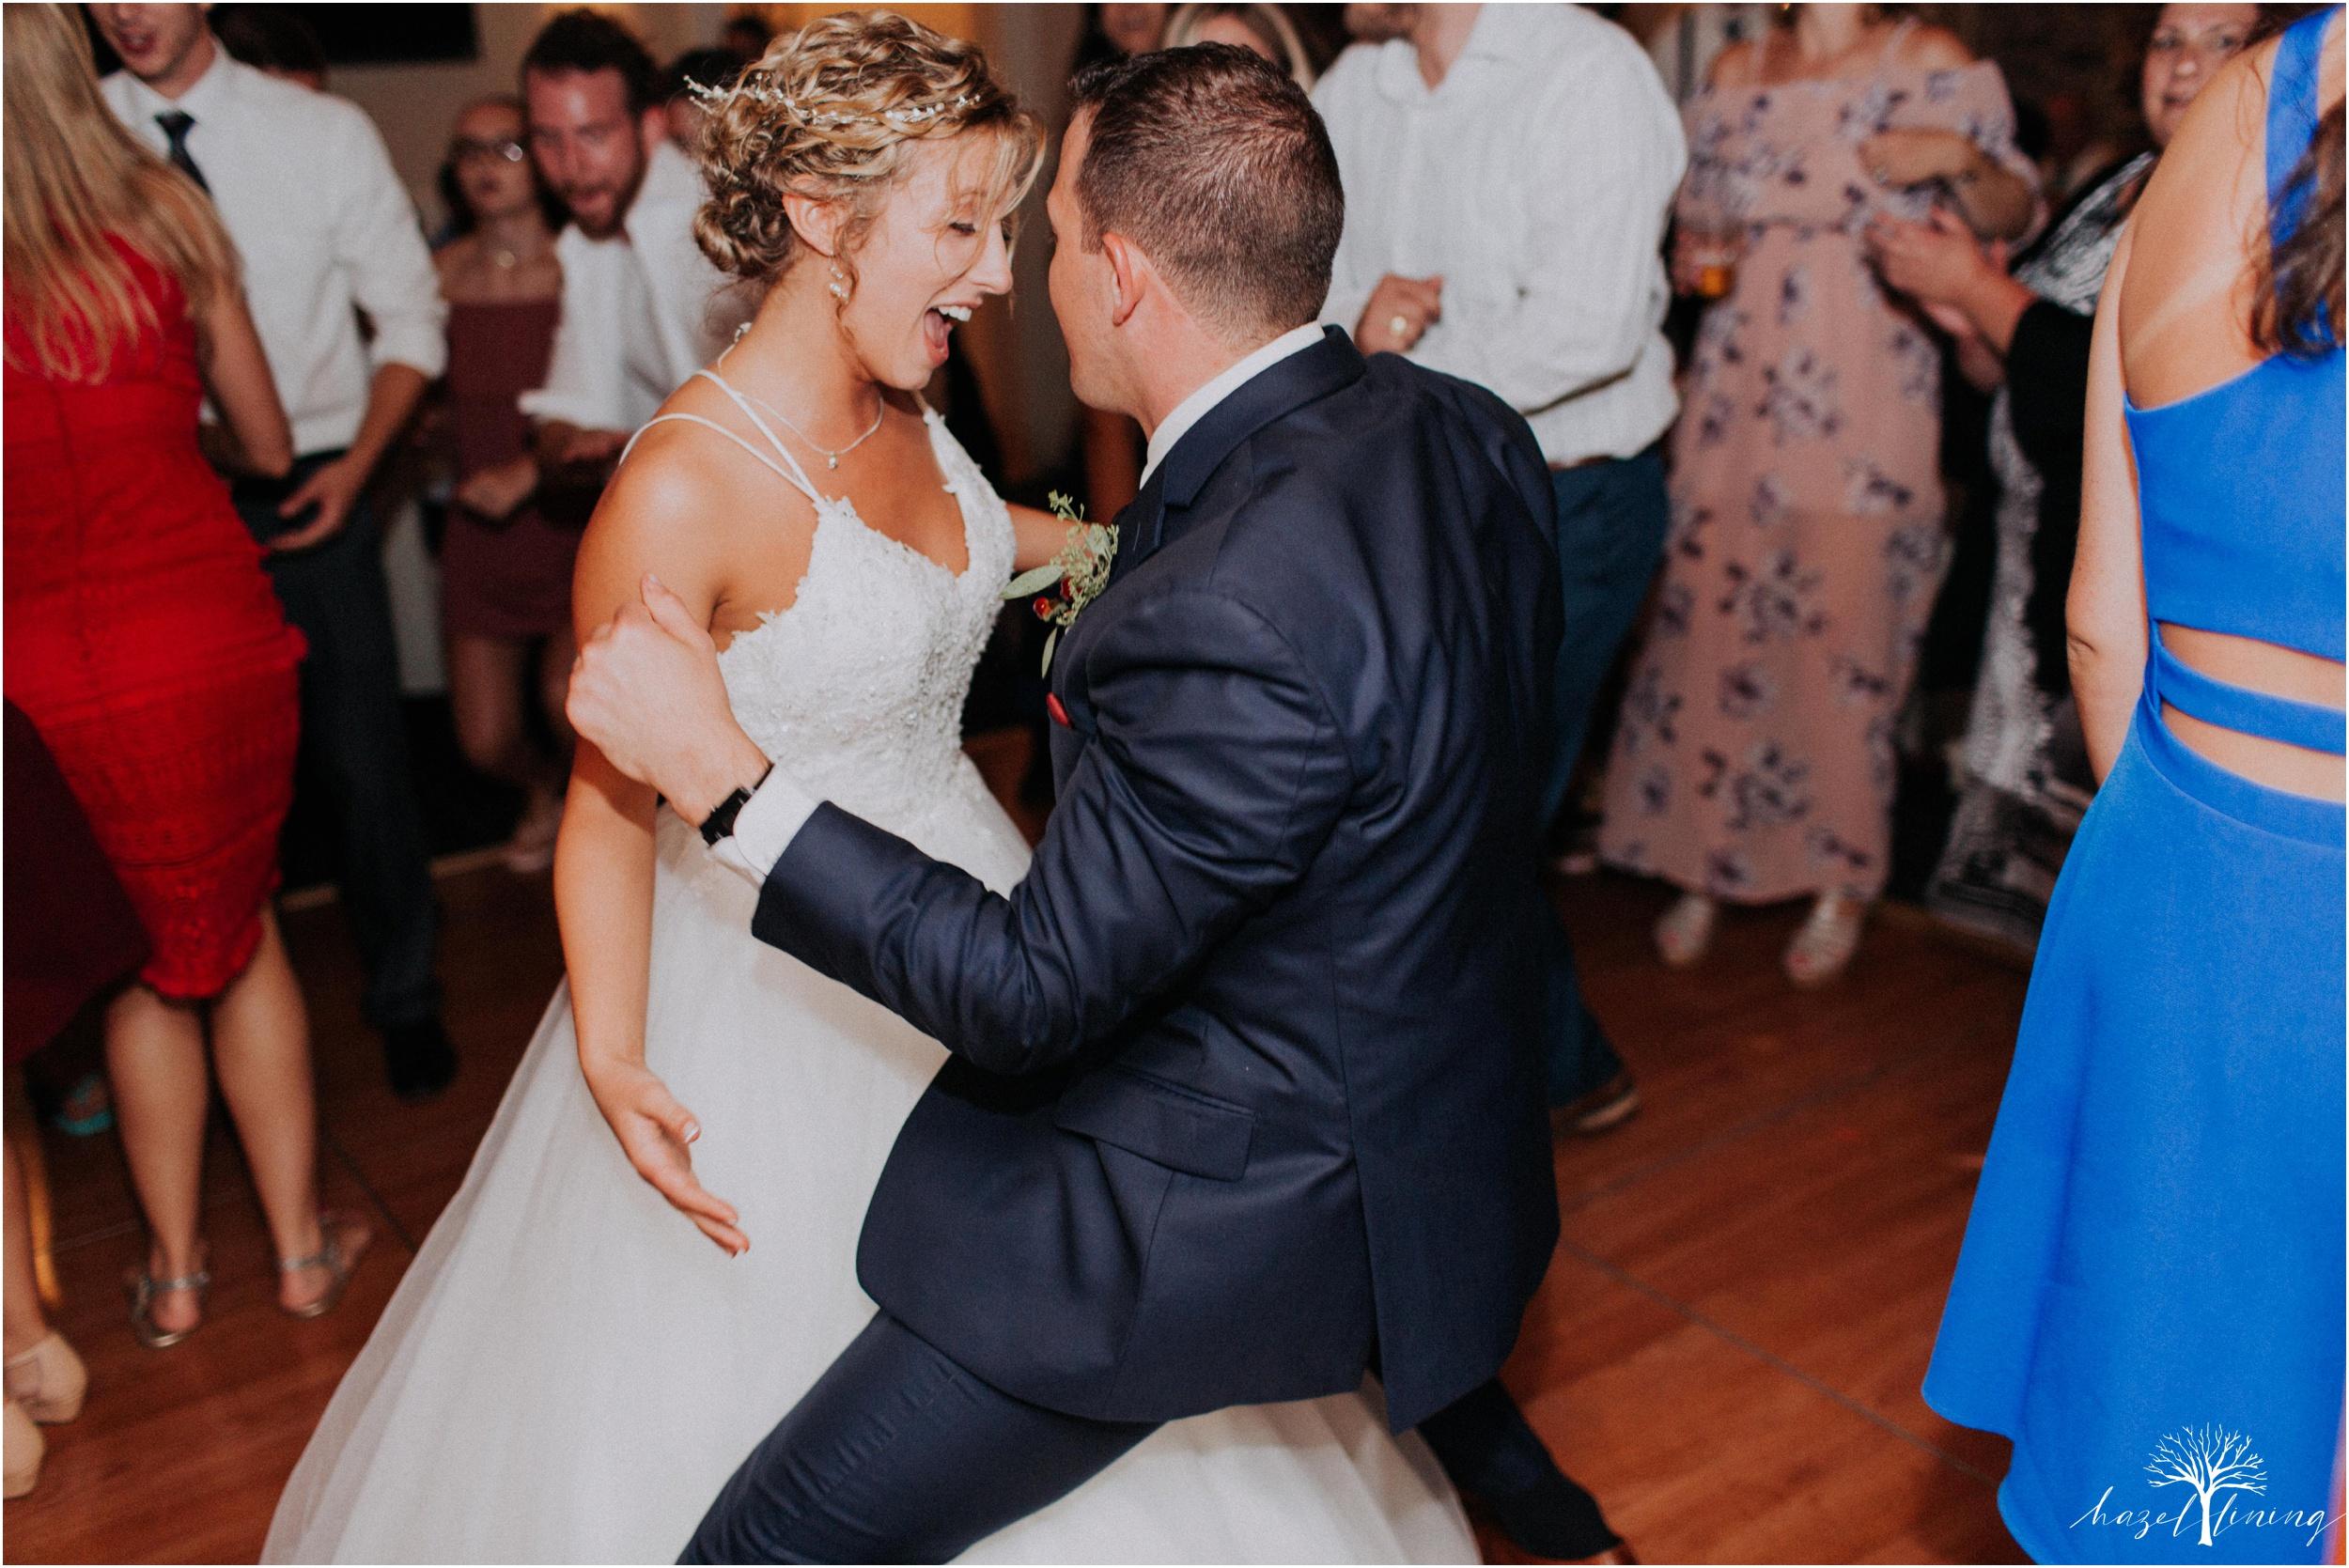 jonathan-weibel-becky-haywood-loft-at-sweetwater-cc-pennsburg-pennsylvania-rainy-day-summer-wedding-hazel-lining-travel-wedding-elopement-photography_0156.jpg